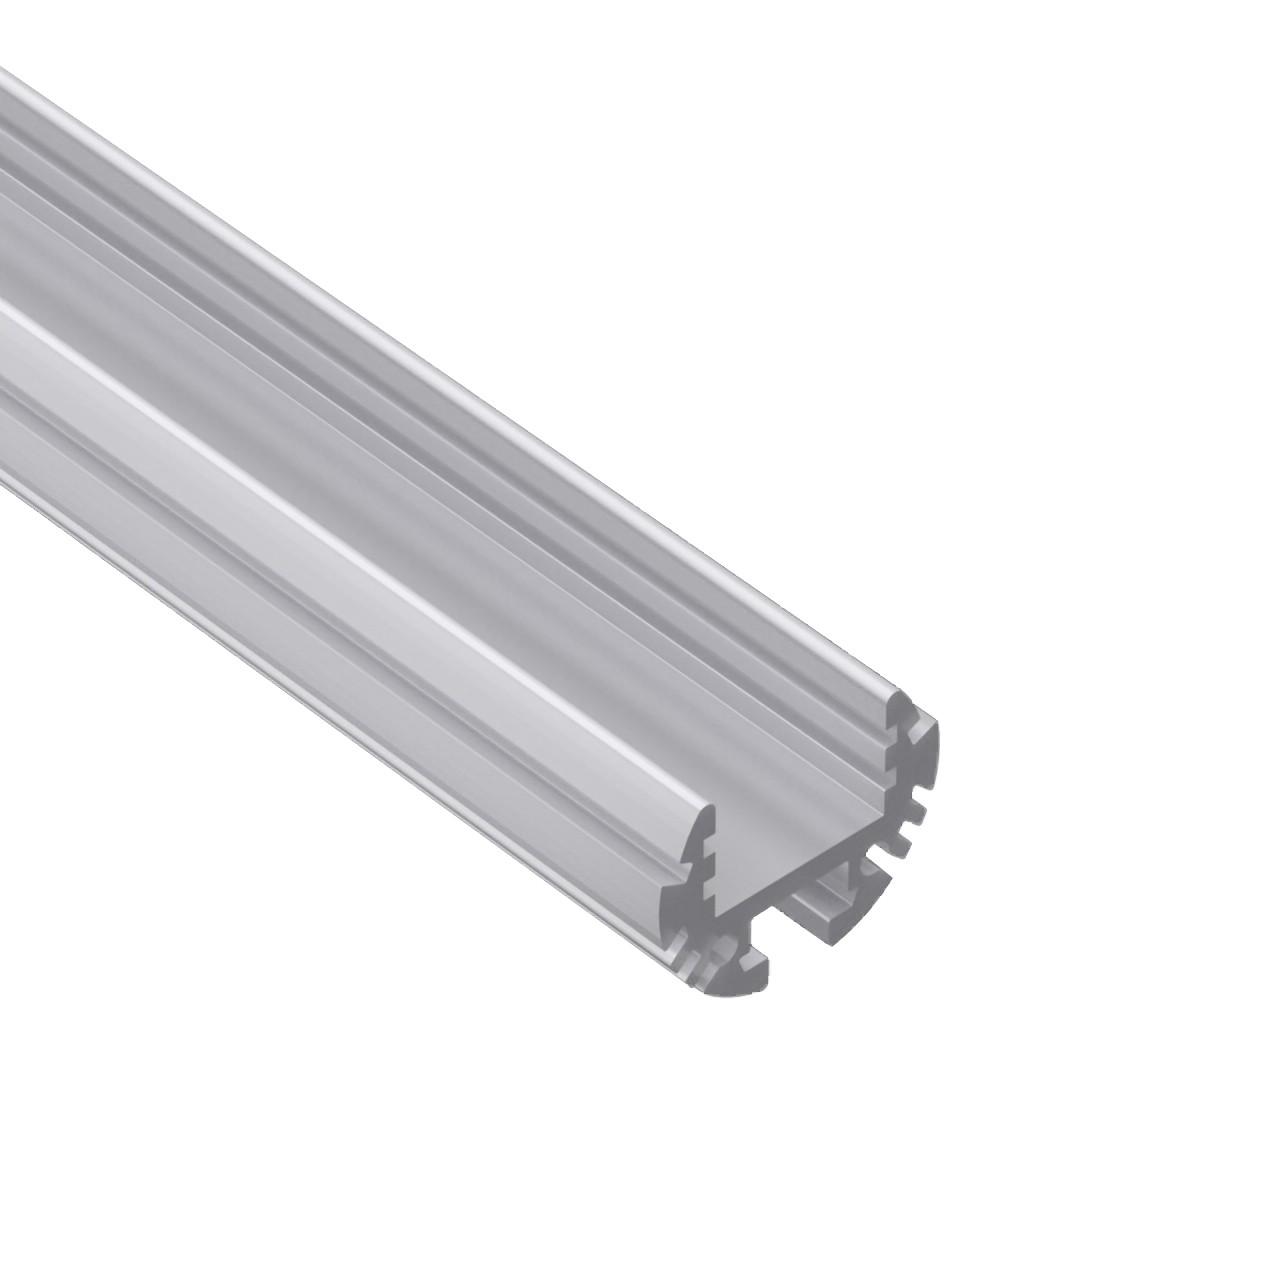 ROUND24 Rodada 24 milímetros ProfileROUND24 Suspenso Perfil LED Rodada de LED Strip dia 24 milímetros